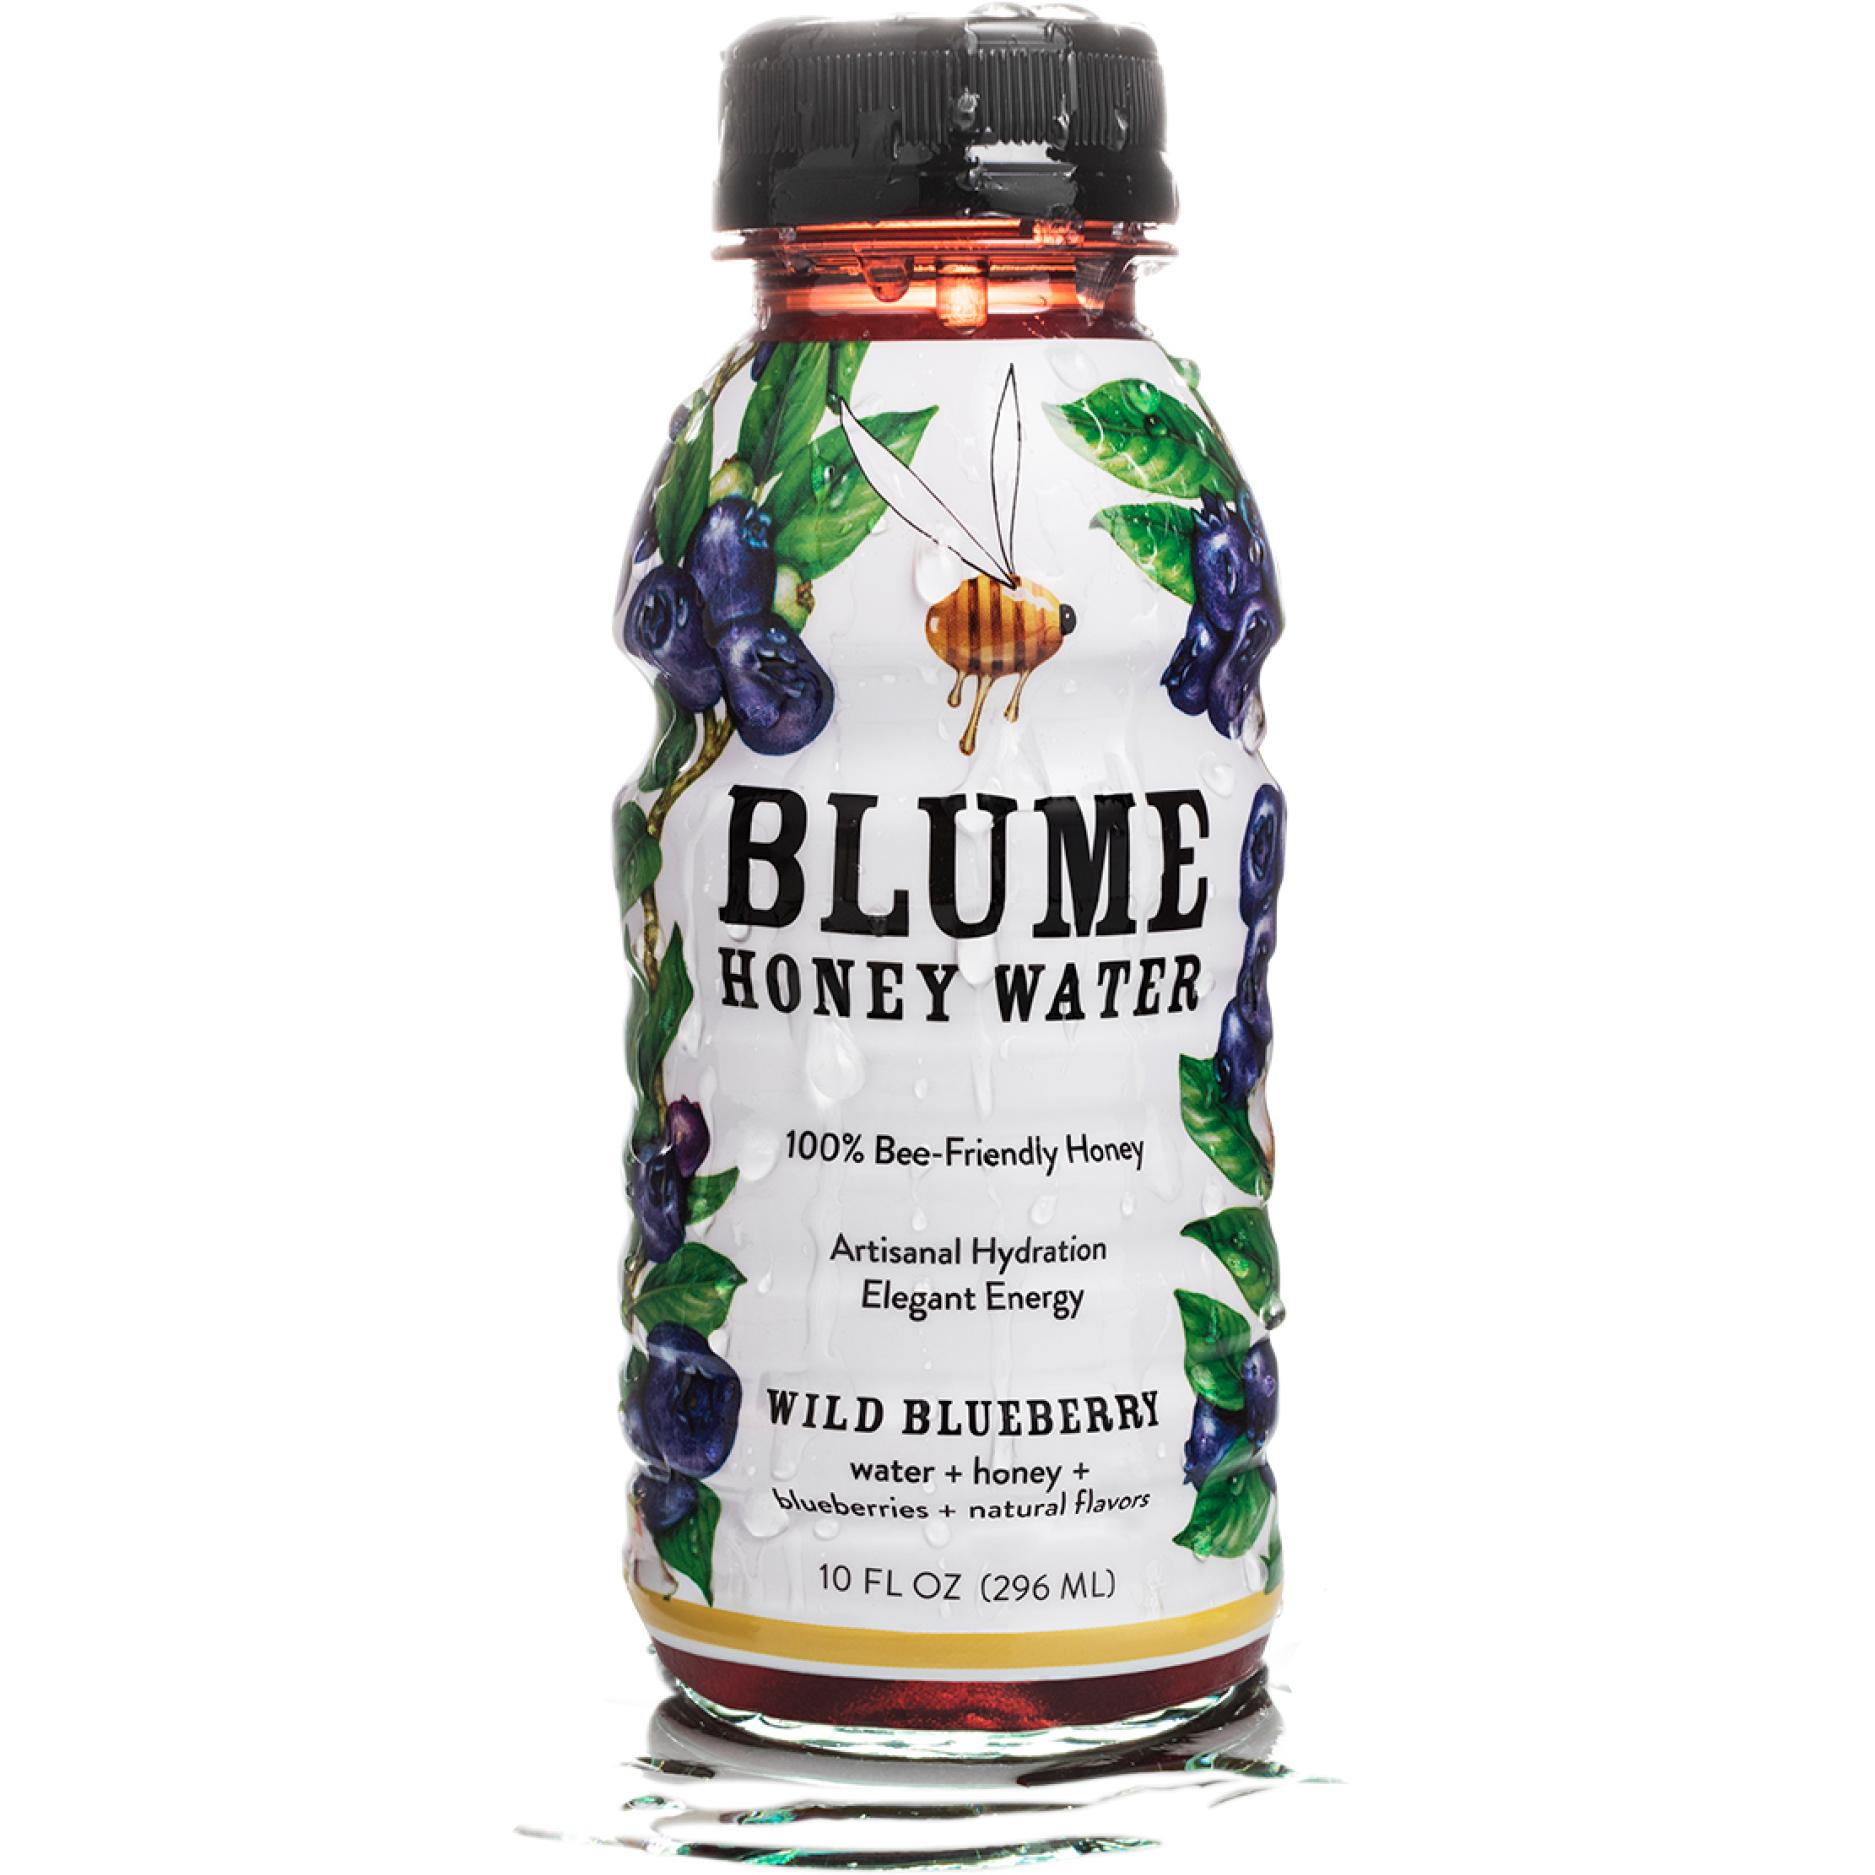 blumebottles-new-2.jpg